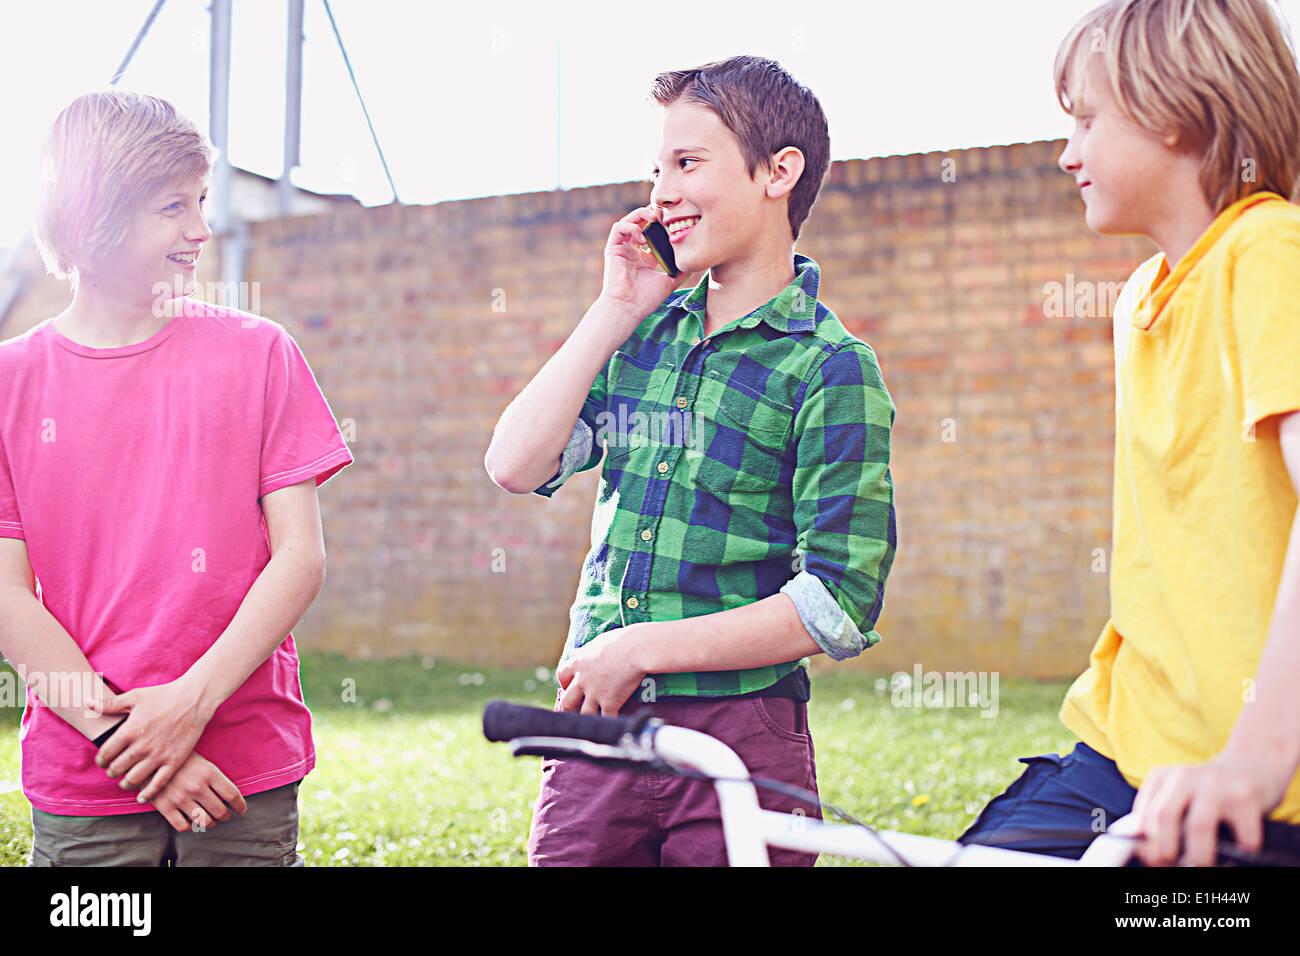 Boy using cell phone avec deux amis Photo Stock